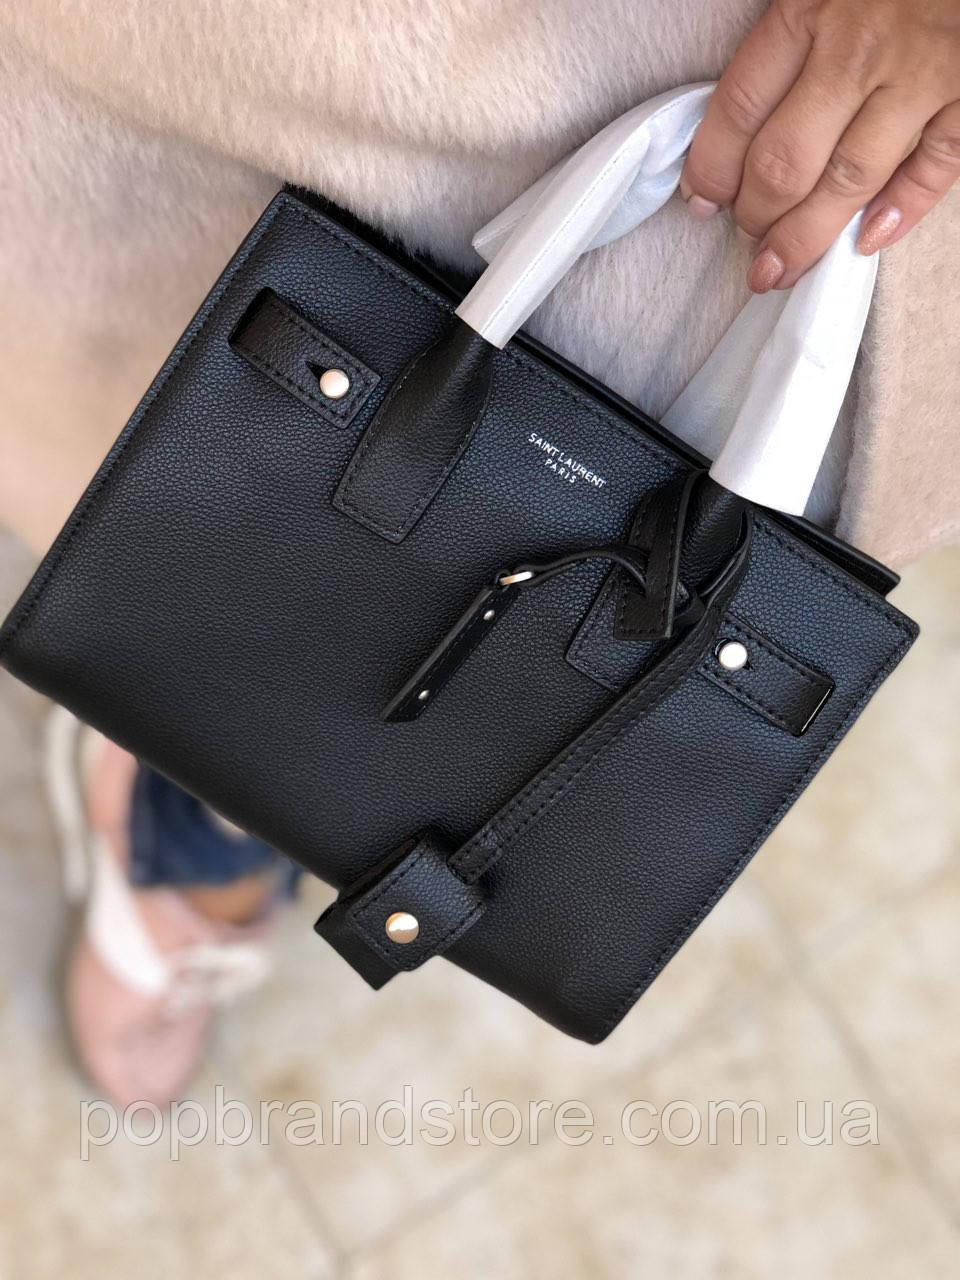 02ecc377622e Классическая женская мини сумочка SAINT LAURENT Sac de Jour (реплика ...